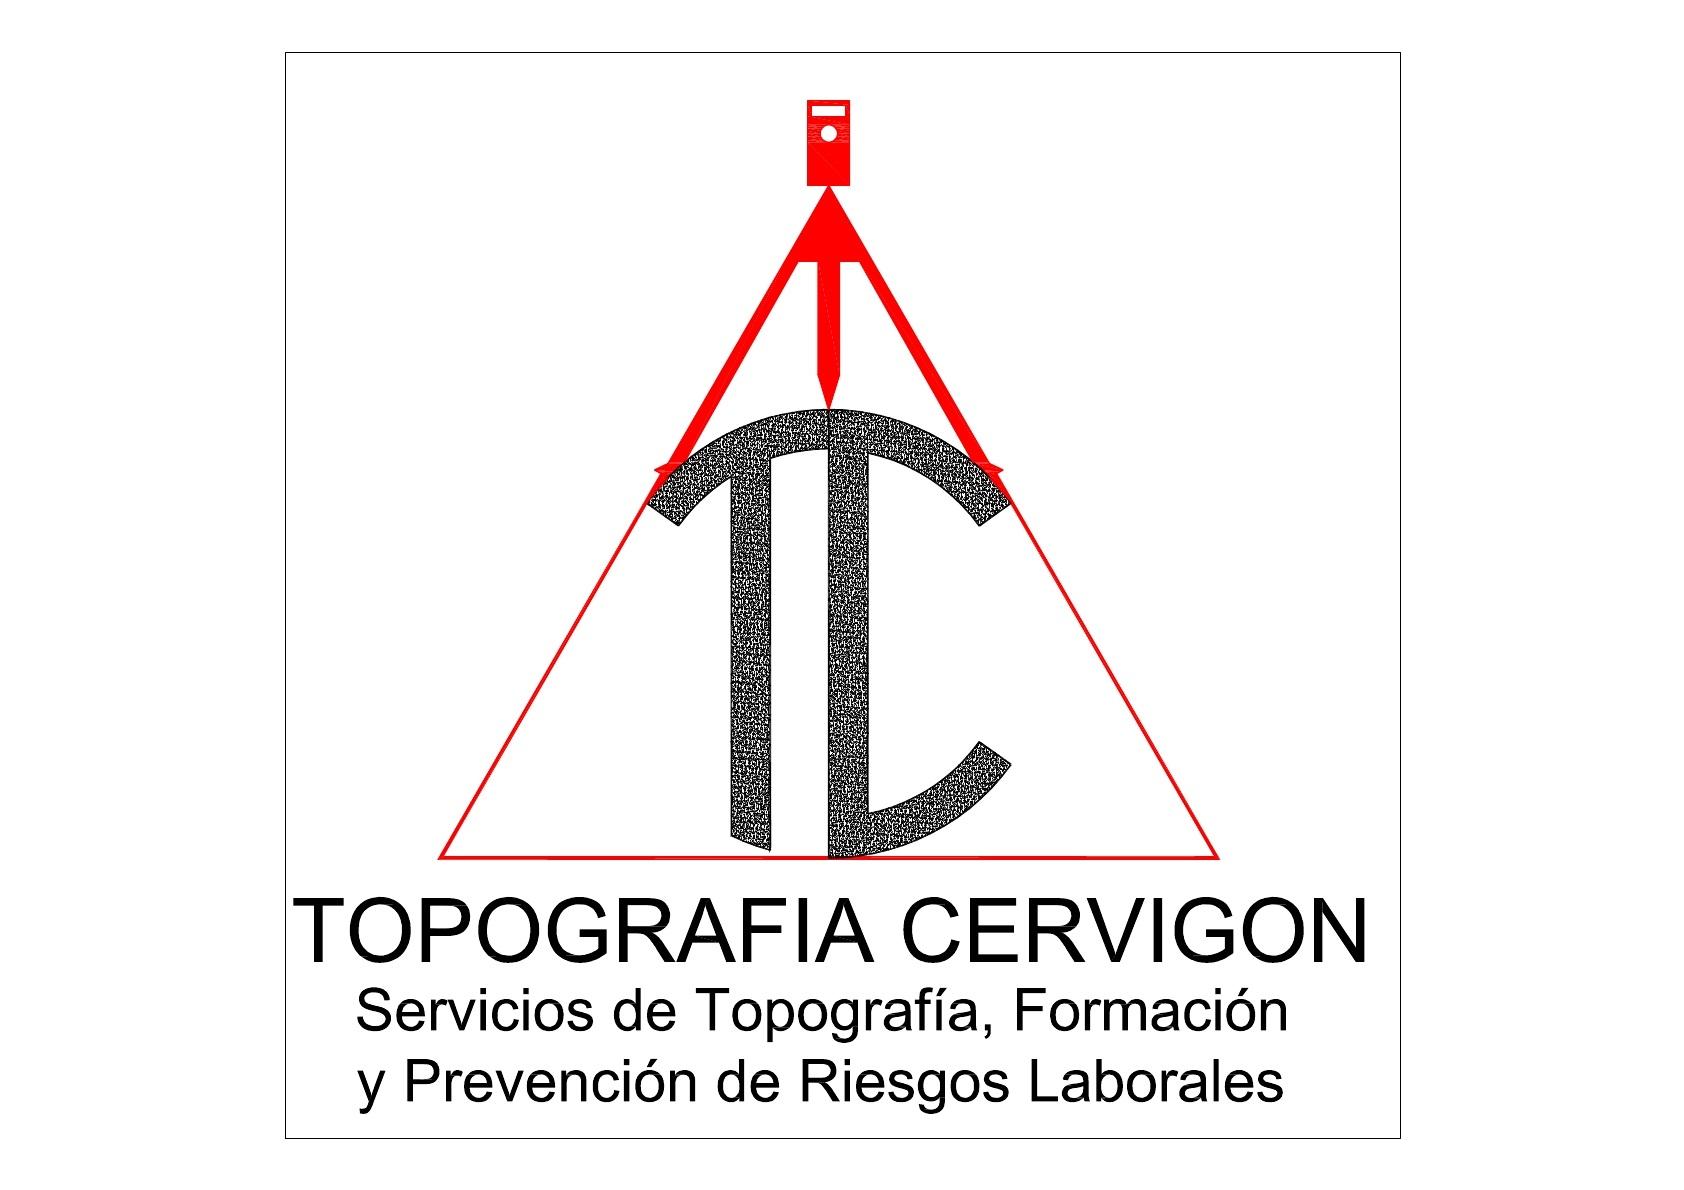 Topografía Cervigon